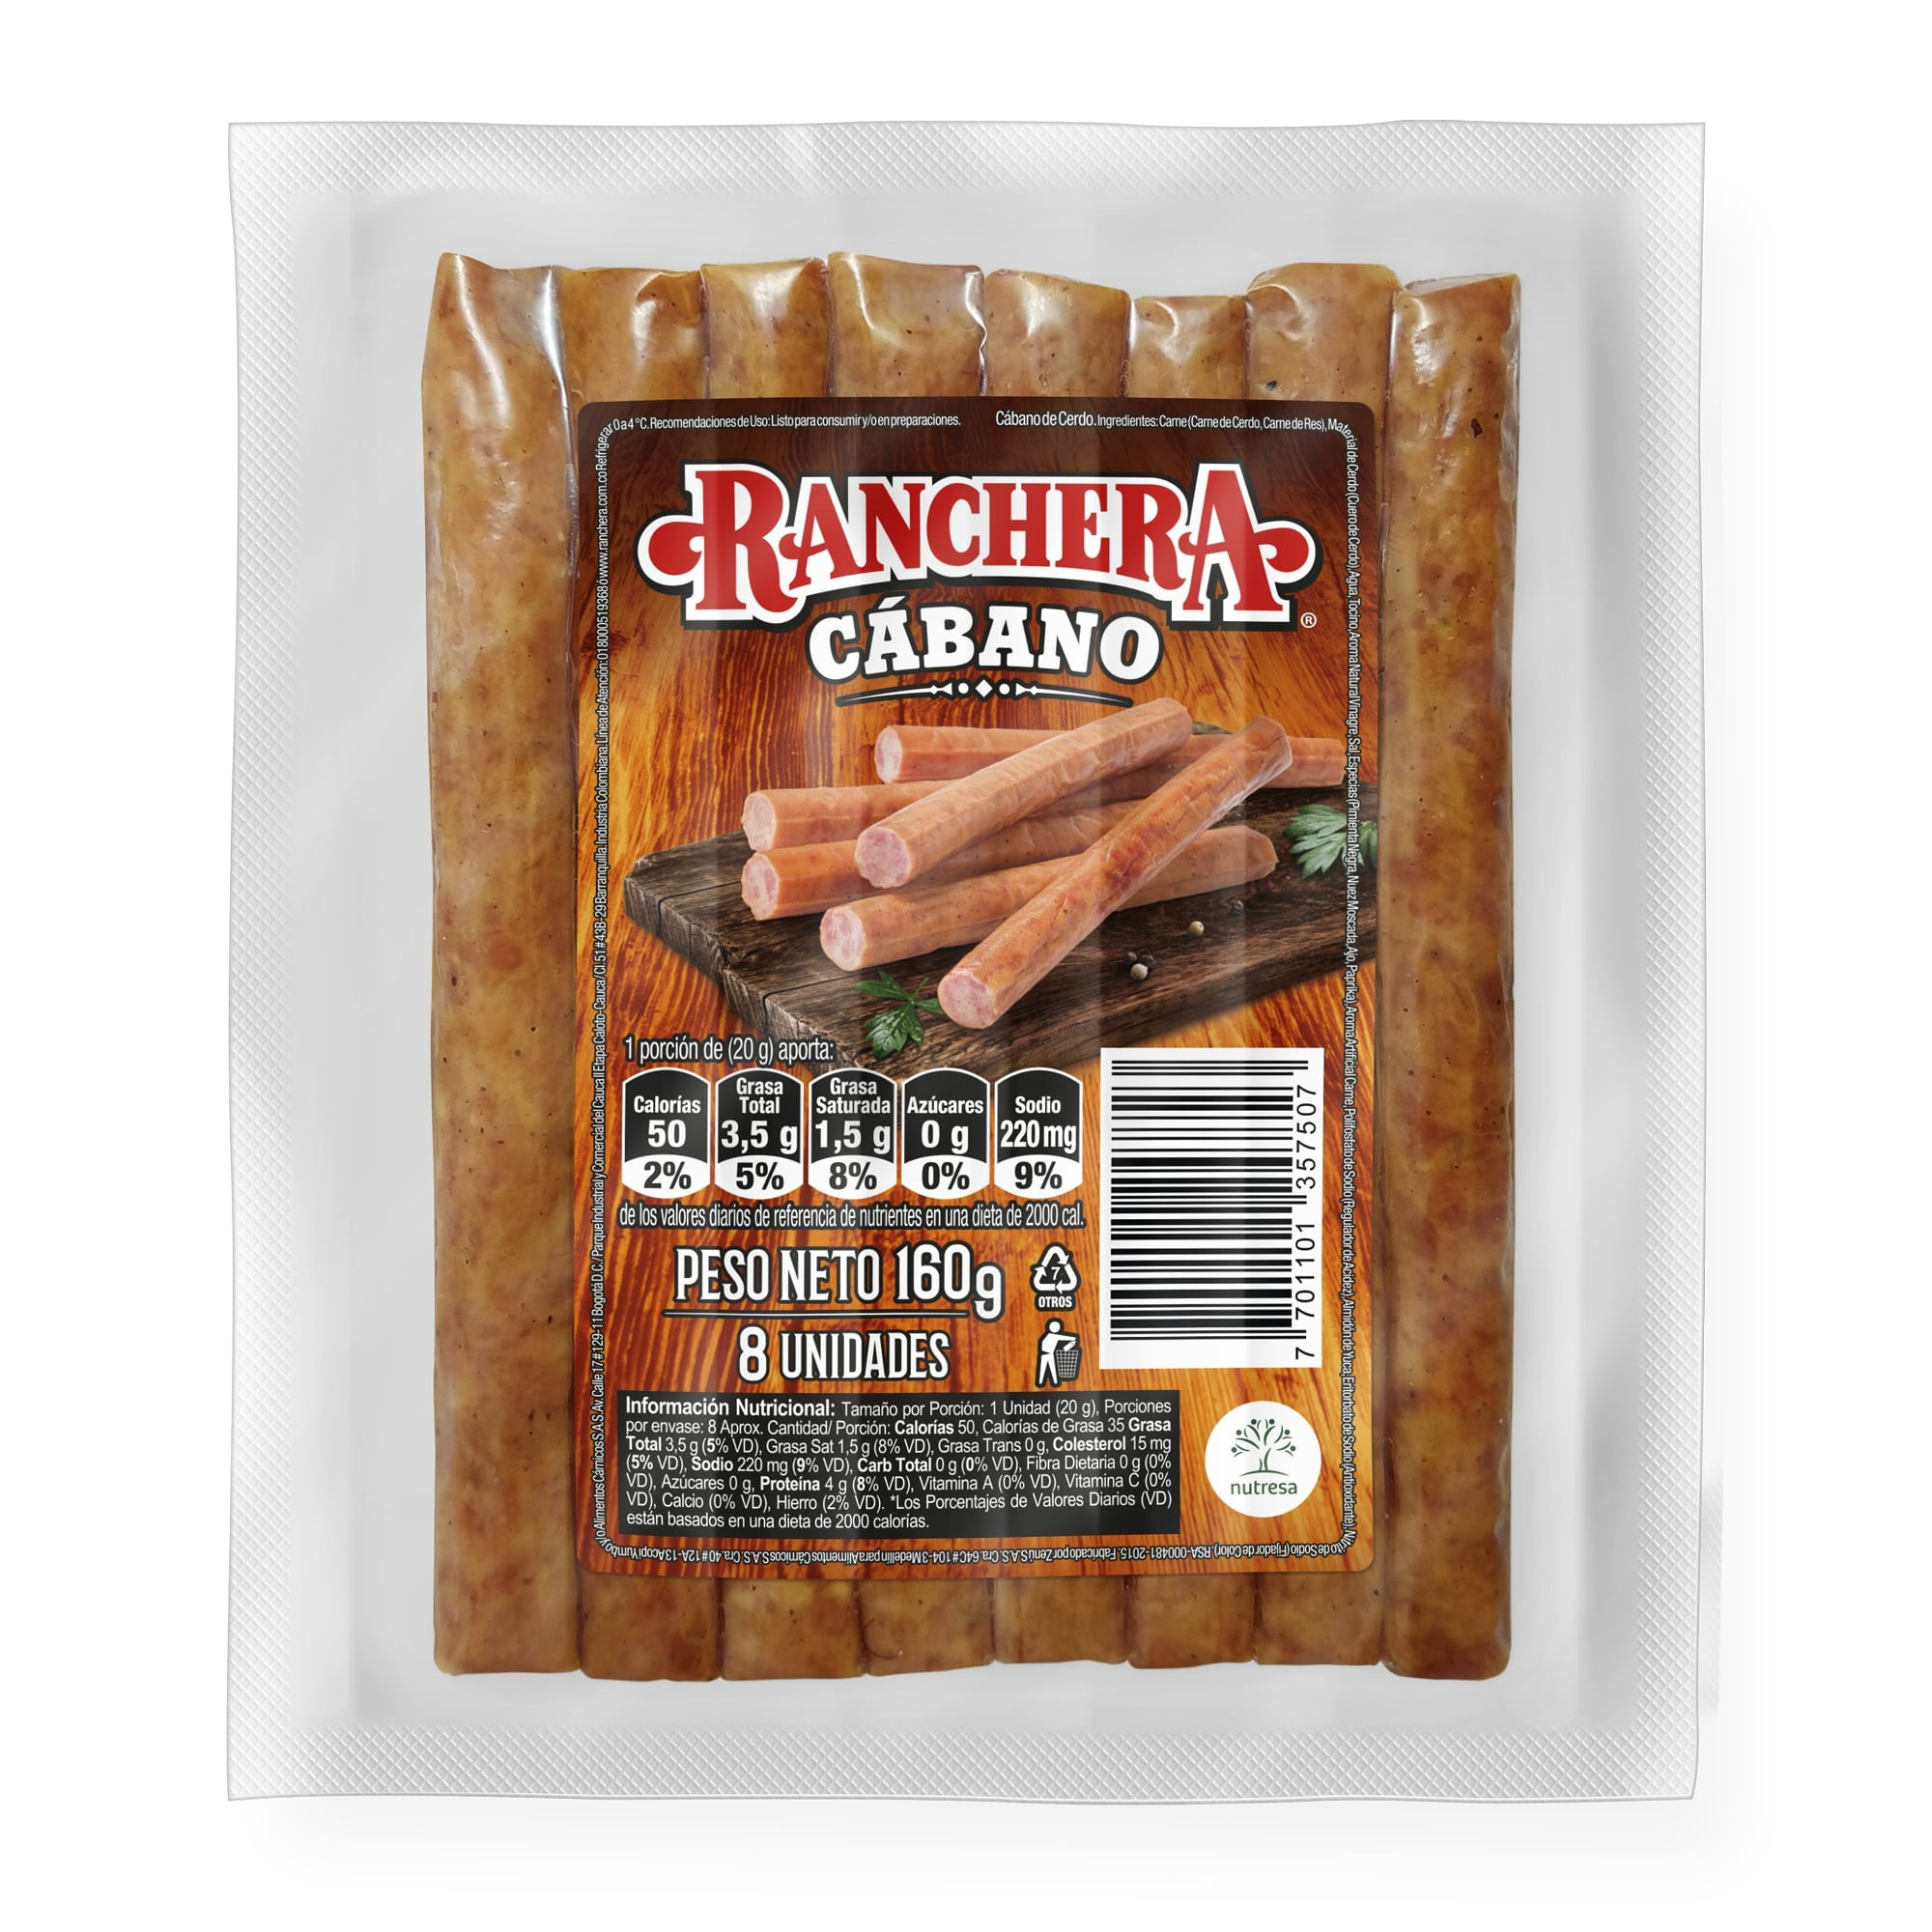 Cabano Ranchera 160g